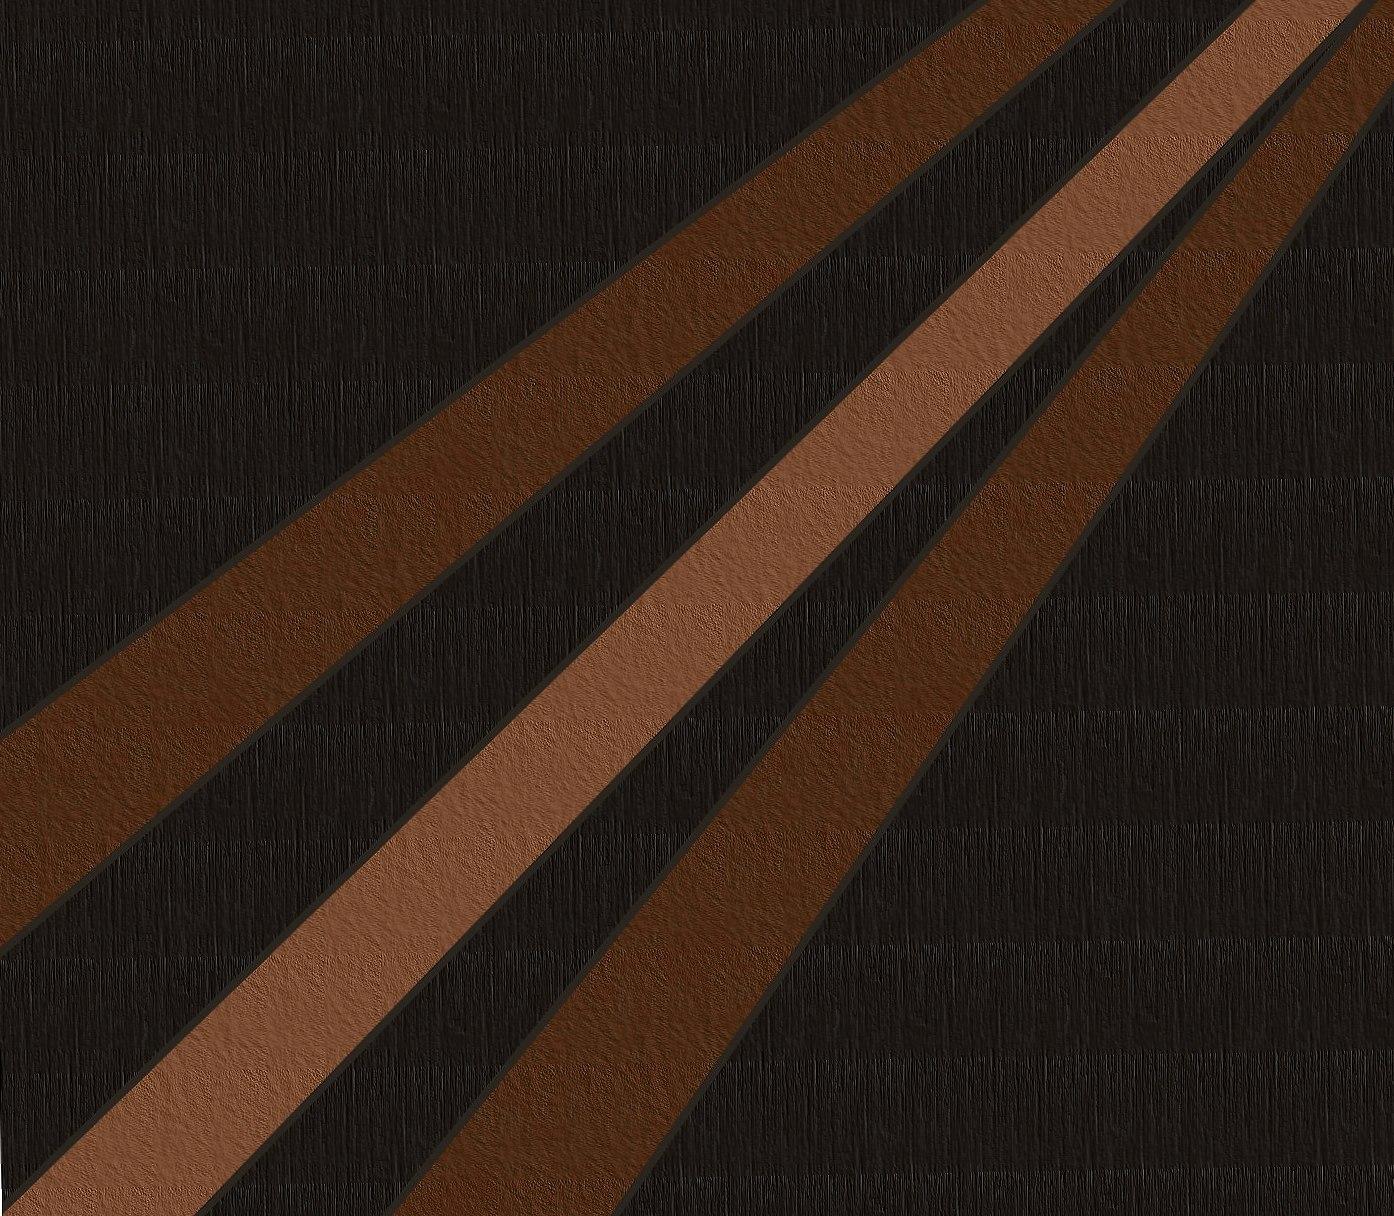 Soft Stripes HD wallpapers HD quality